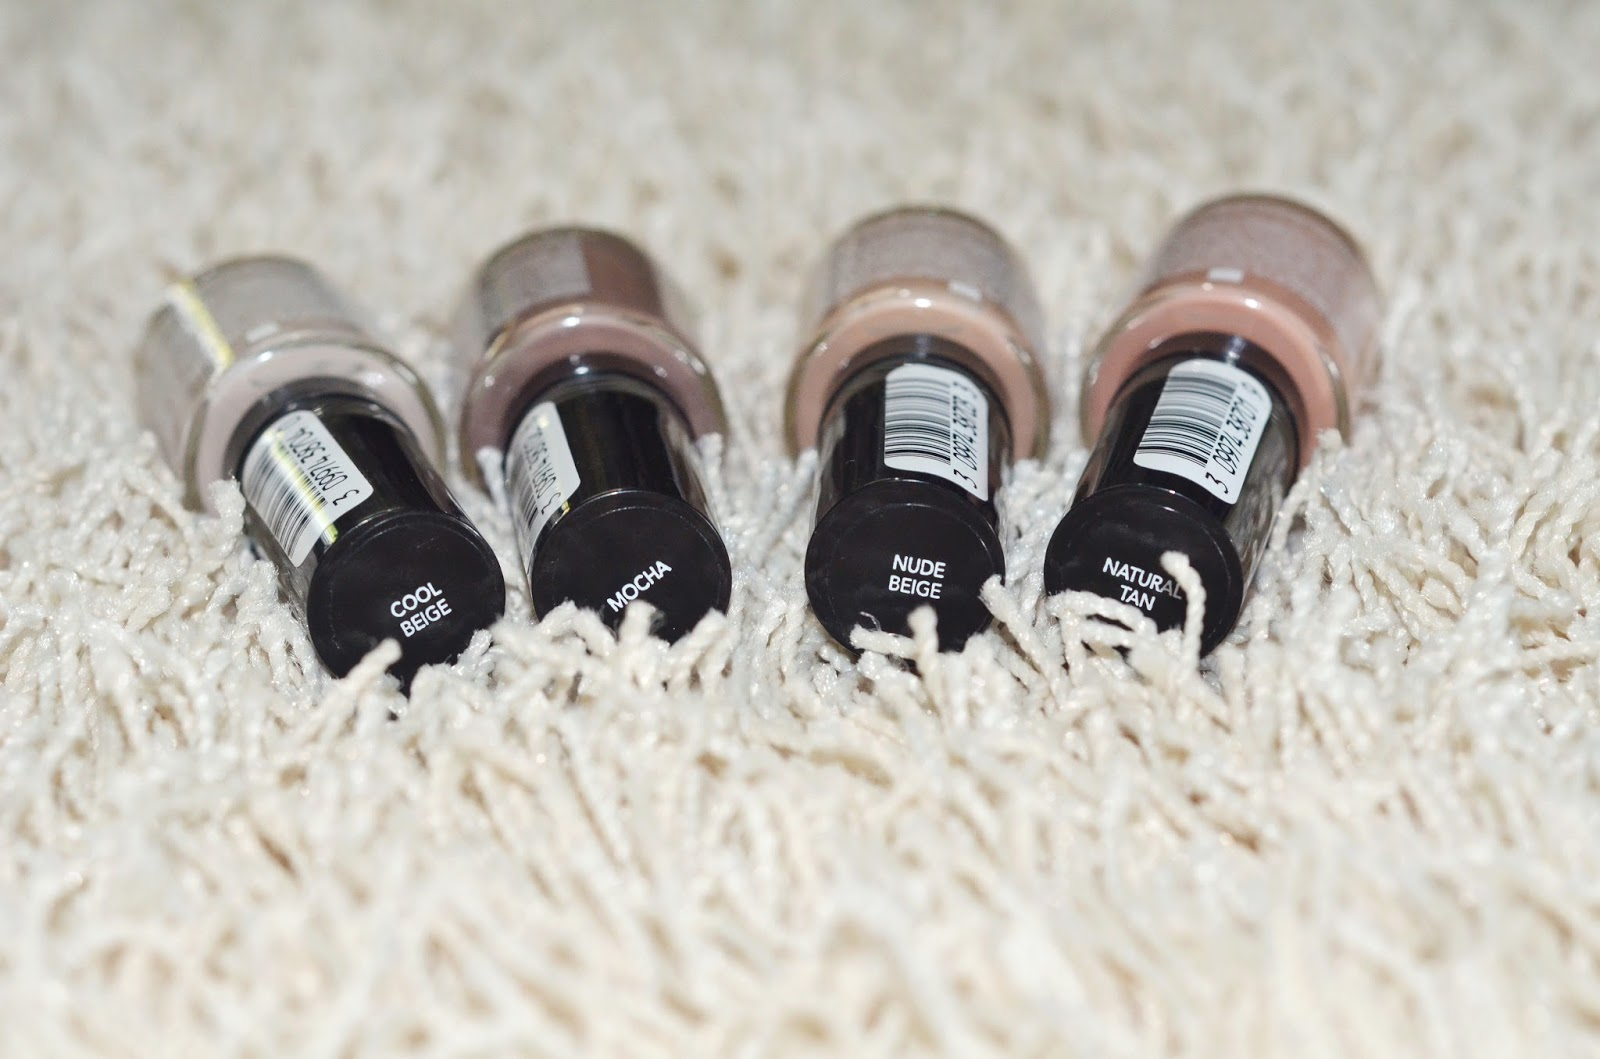 Revlon Colorstay Longwear Nail Enamel Review